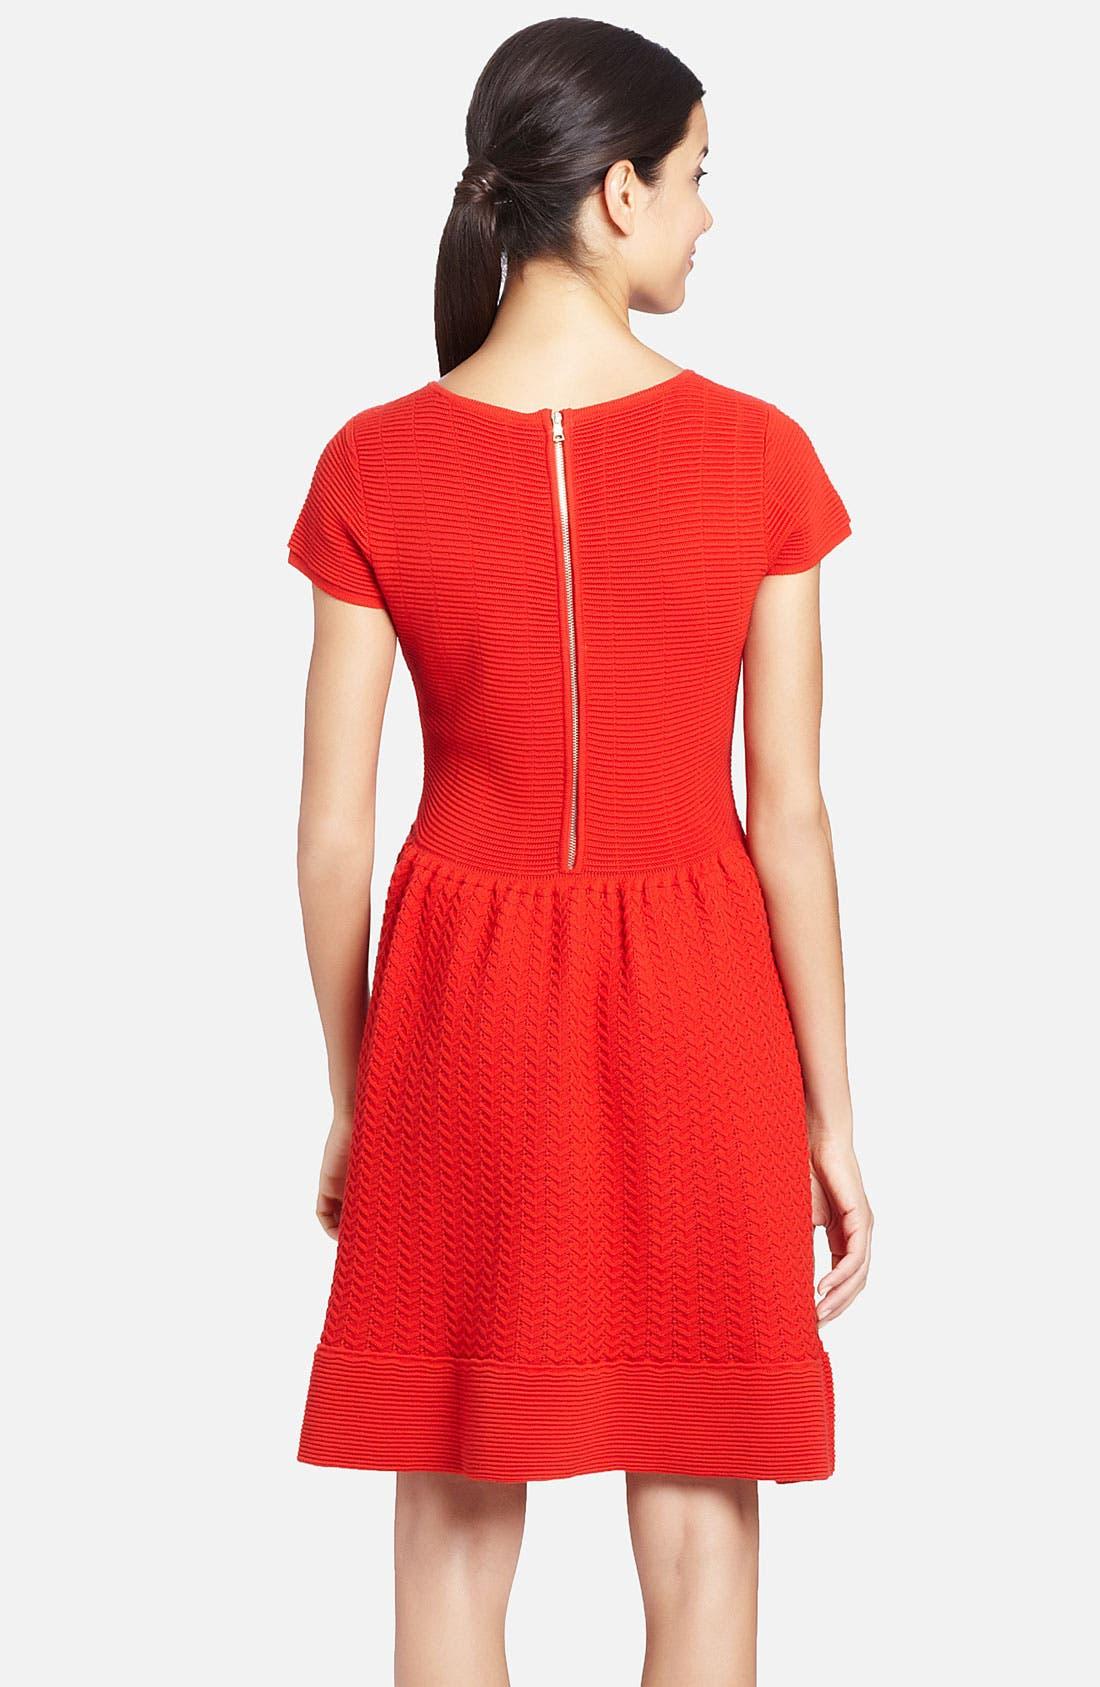 Alternate Image 2  - Cynthia Steffe 'Marley' Knit Merino Wool Fit & Flare Dress